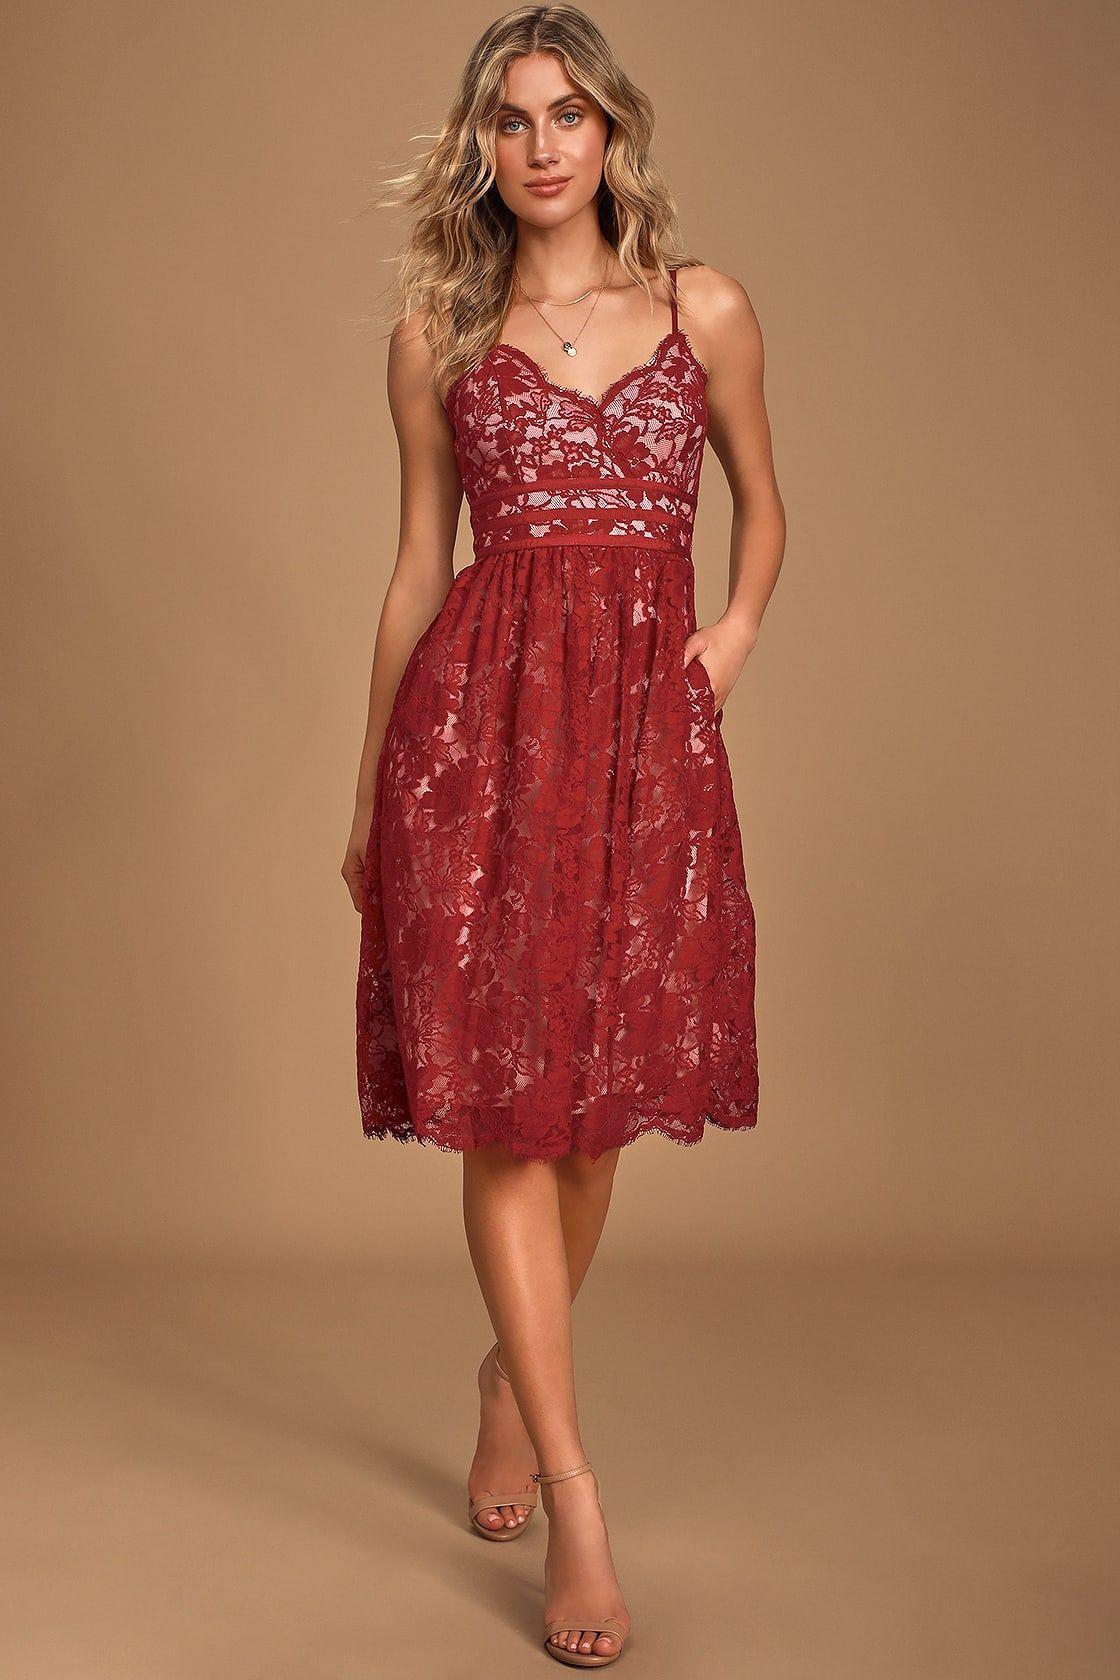 Treasure Me Wine Red Lace Midi Dress Red Lace Midi Dress Lace Midi Dress Midi Dress Sleeveless [ 1680 x 1120 Pixel ]